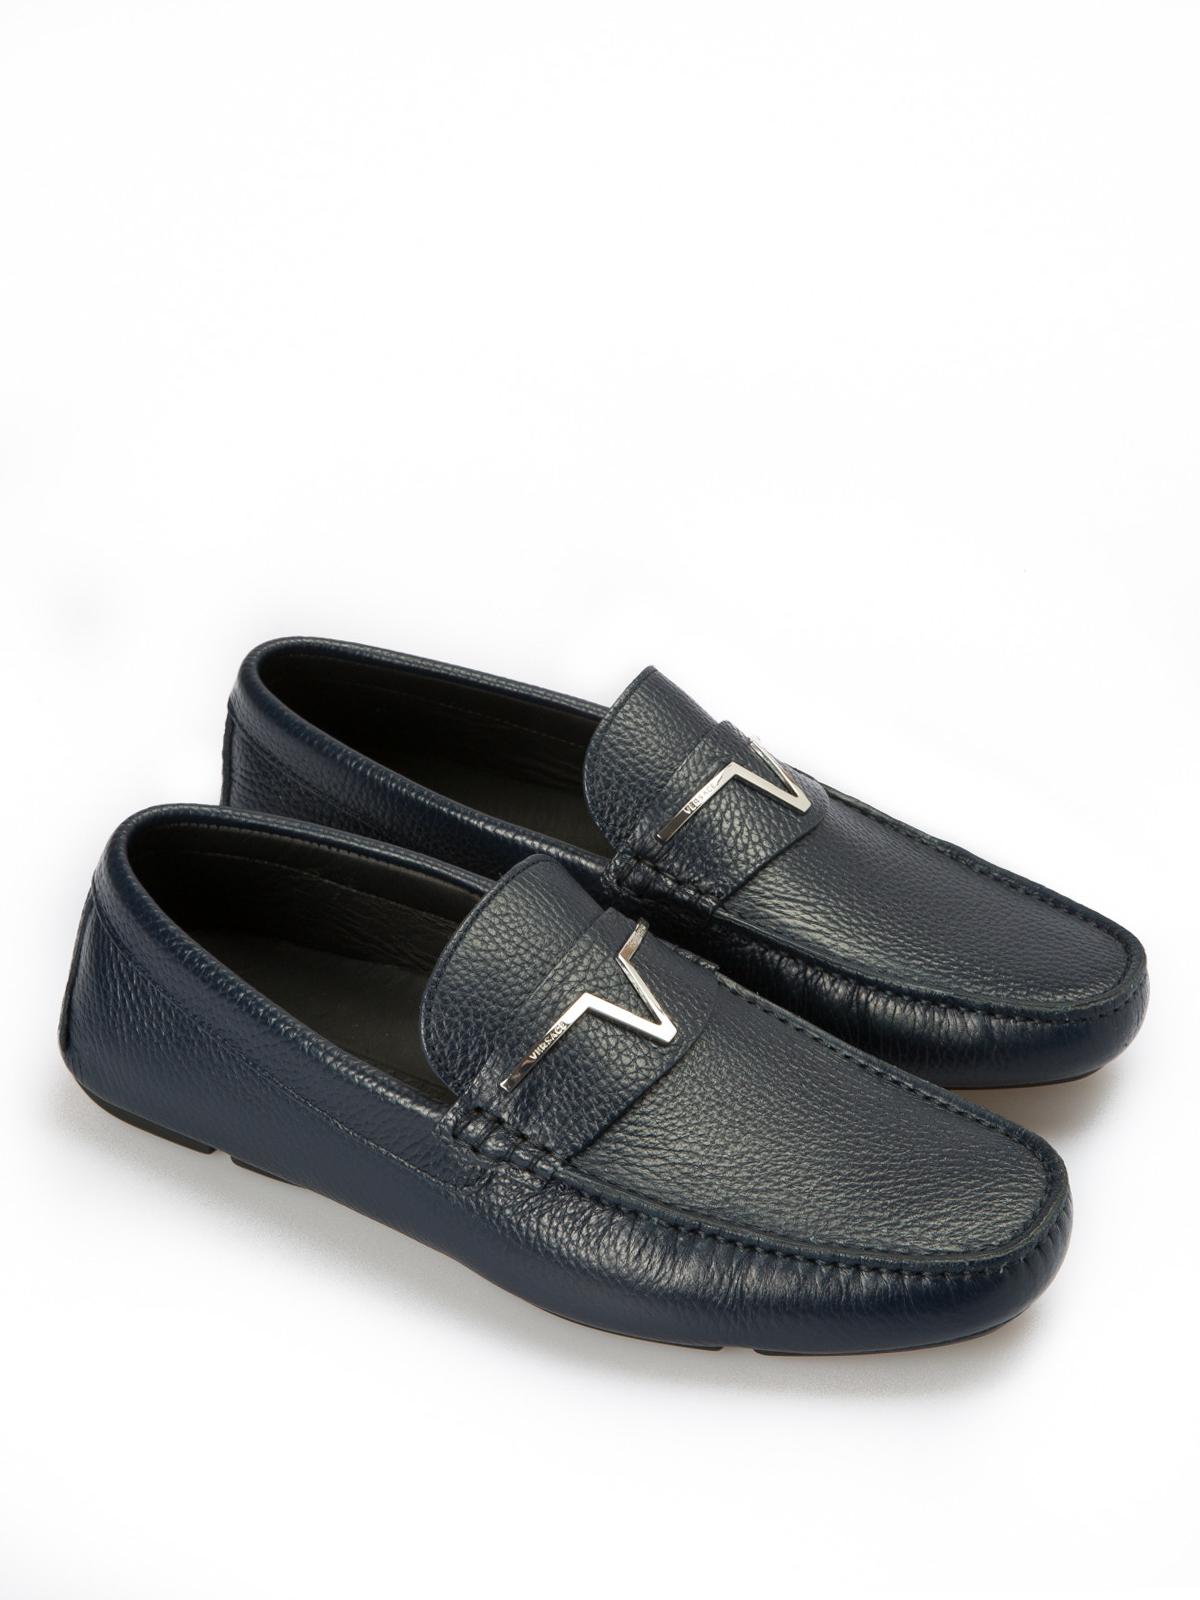 Medusa driver shoes - Loafers